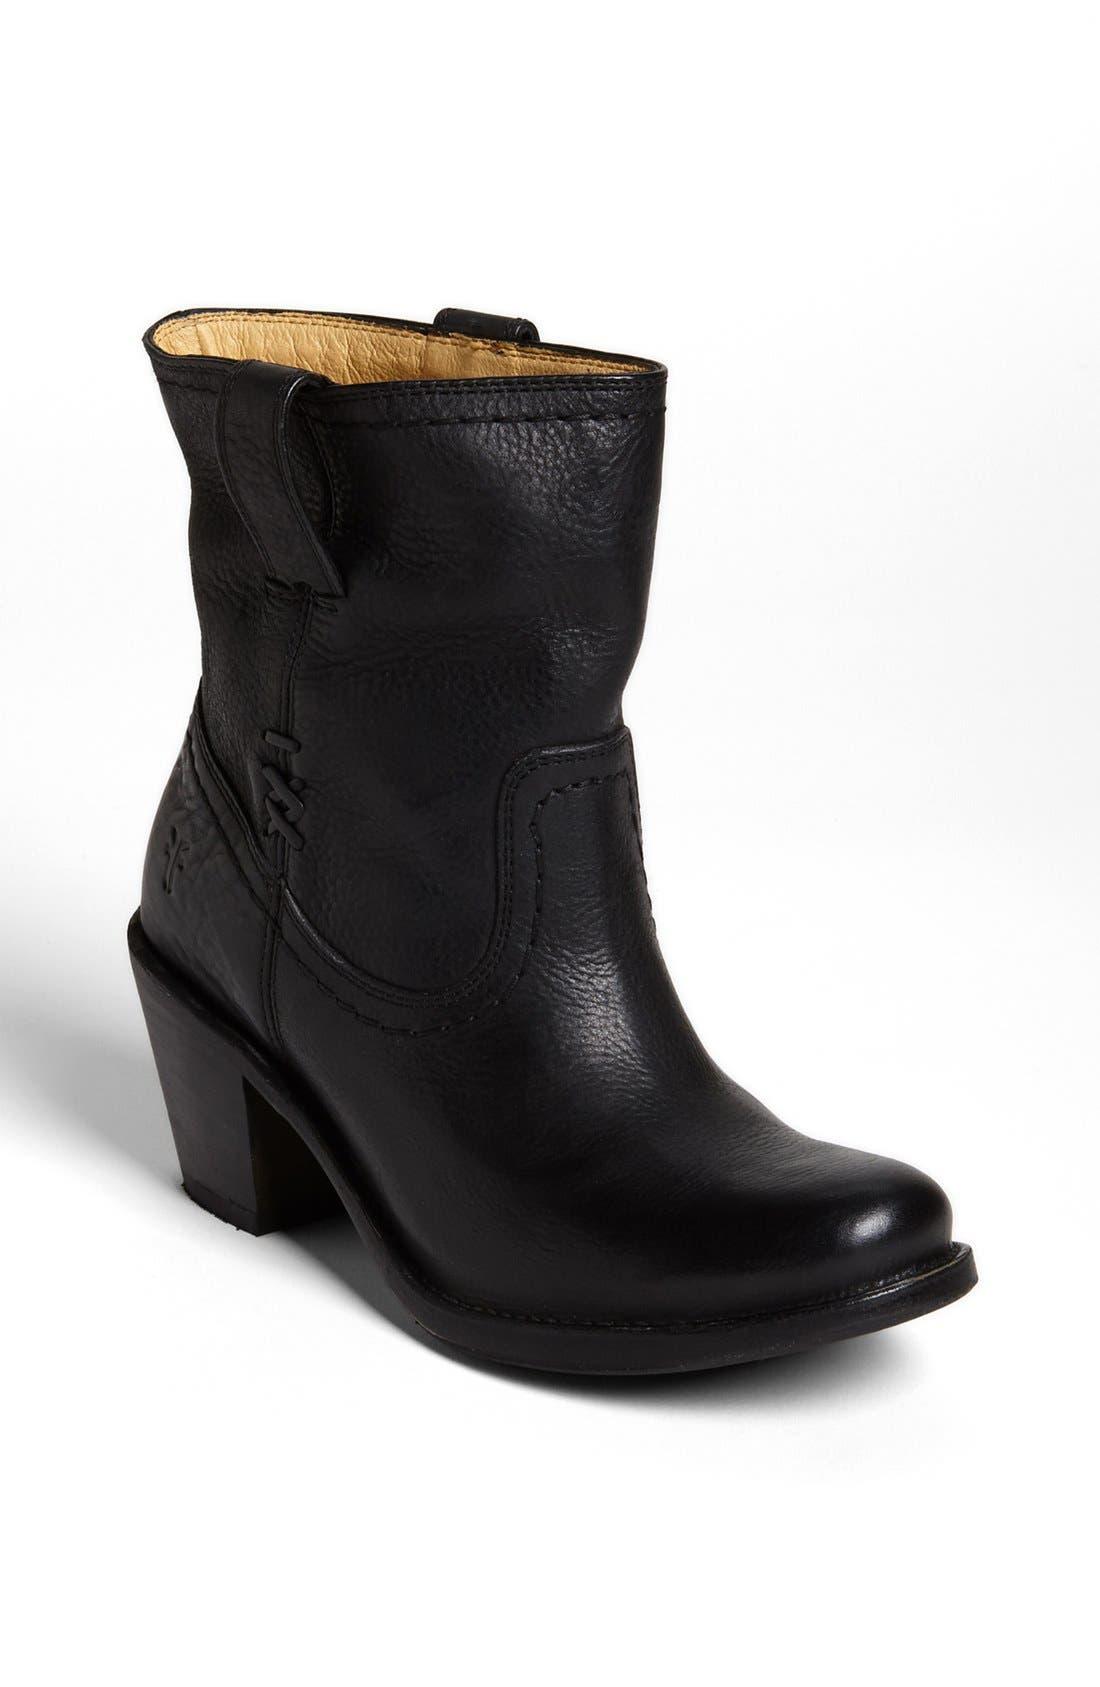 Main Image - Frye 'Carmen - X Stitch' Short Boot